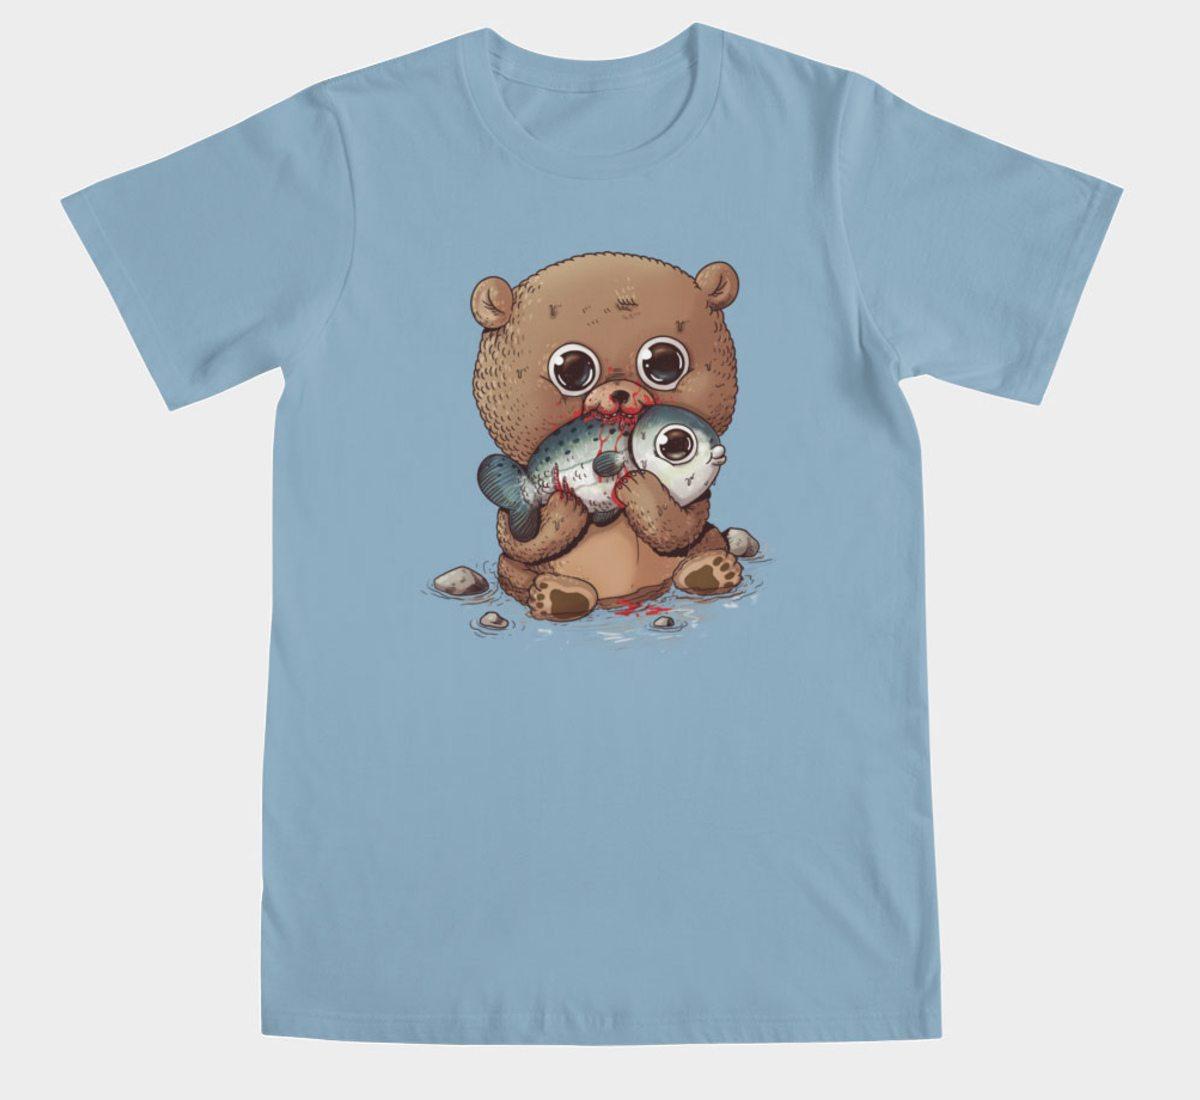 shirt_guys_01f1sh